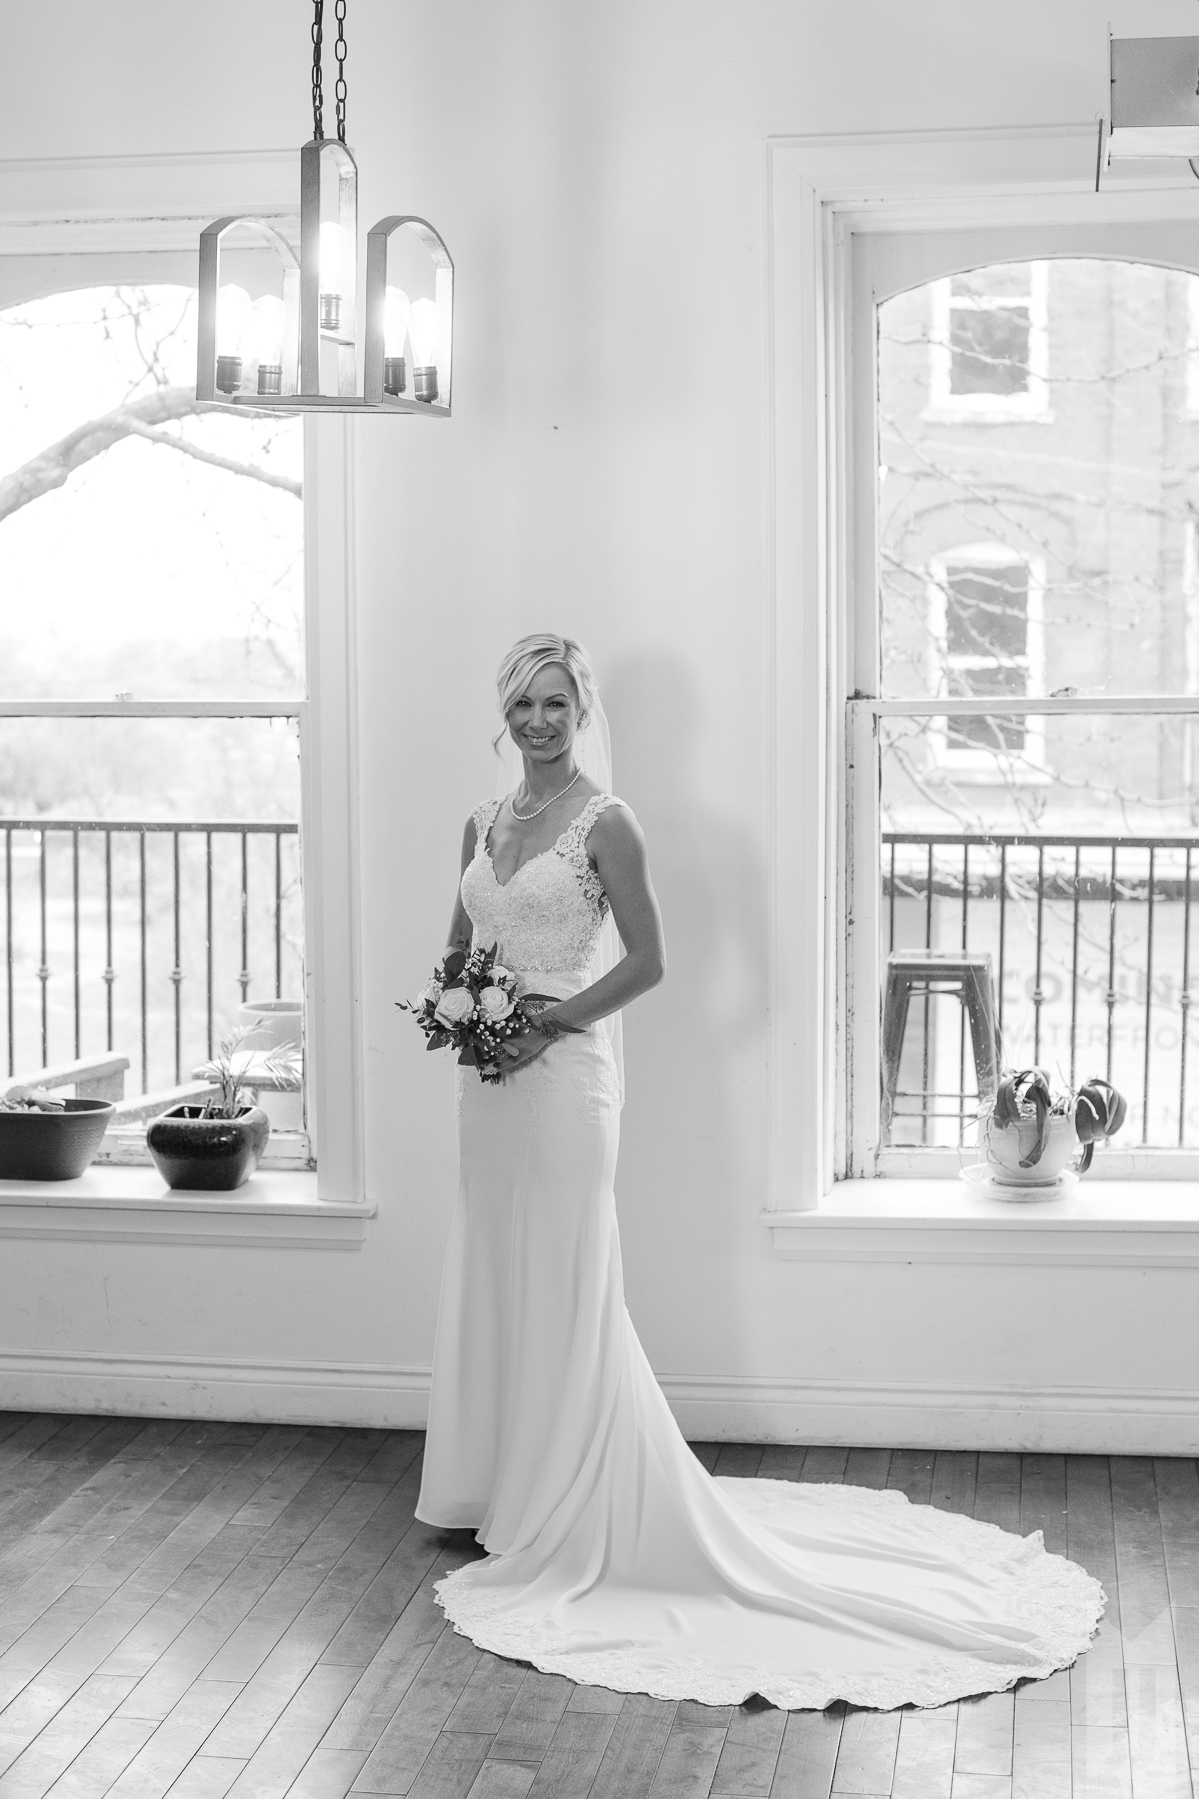 RL_Wedding_Tall-6.jpg